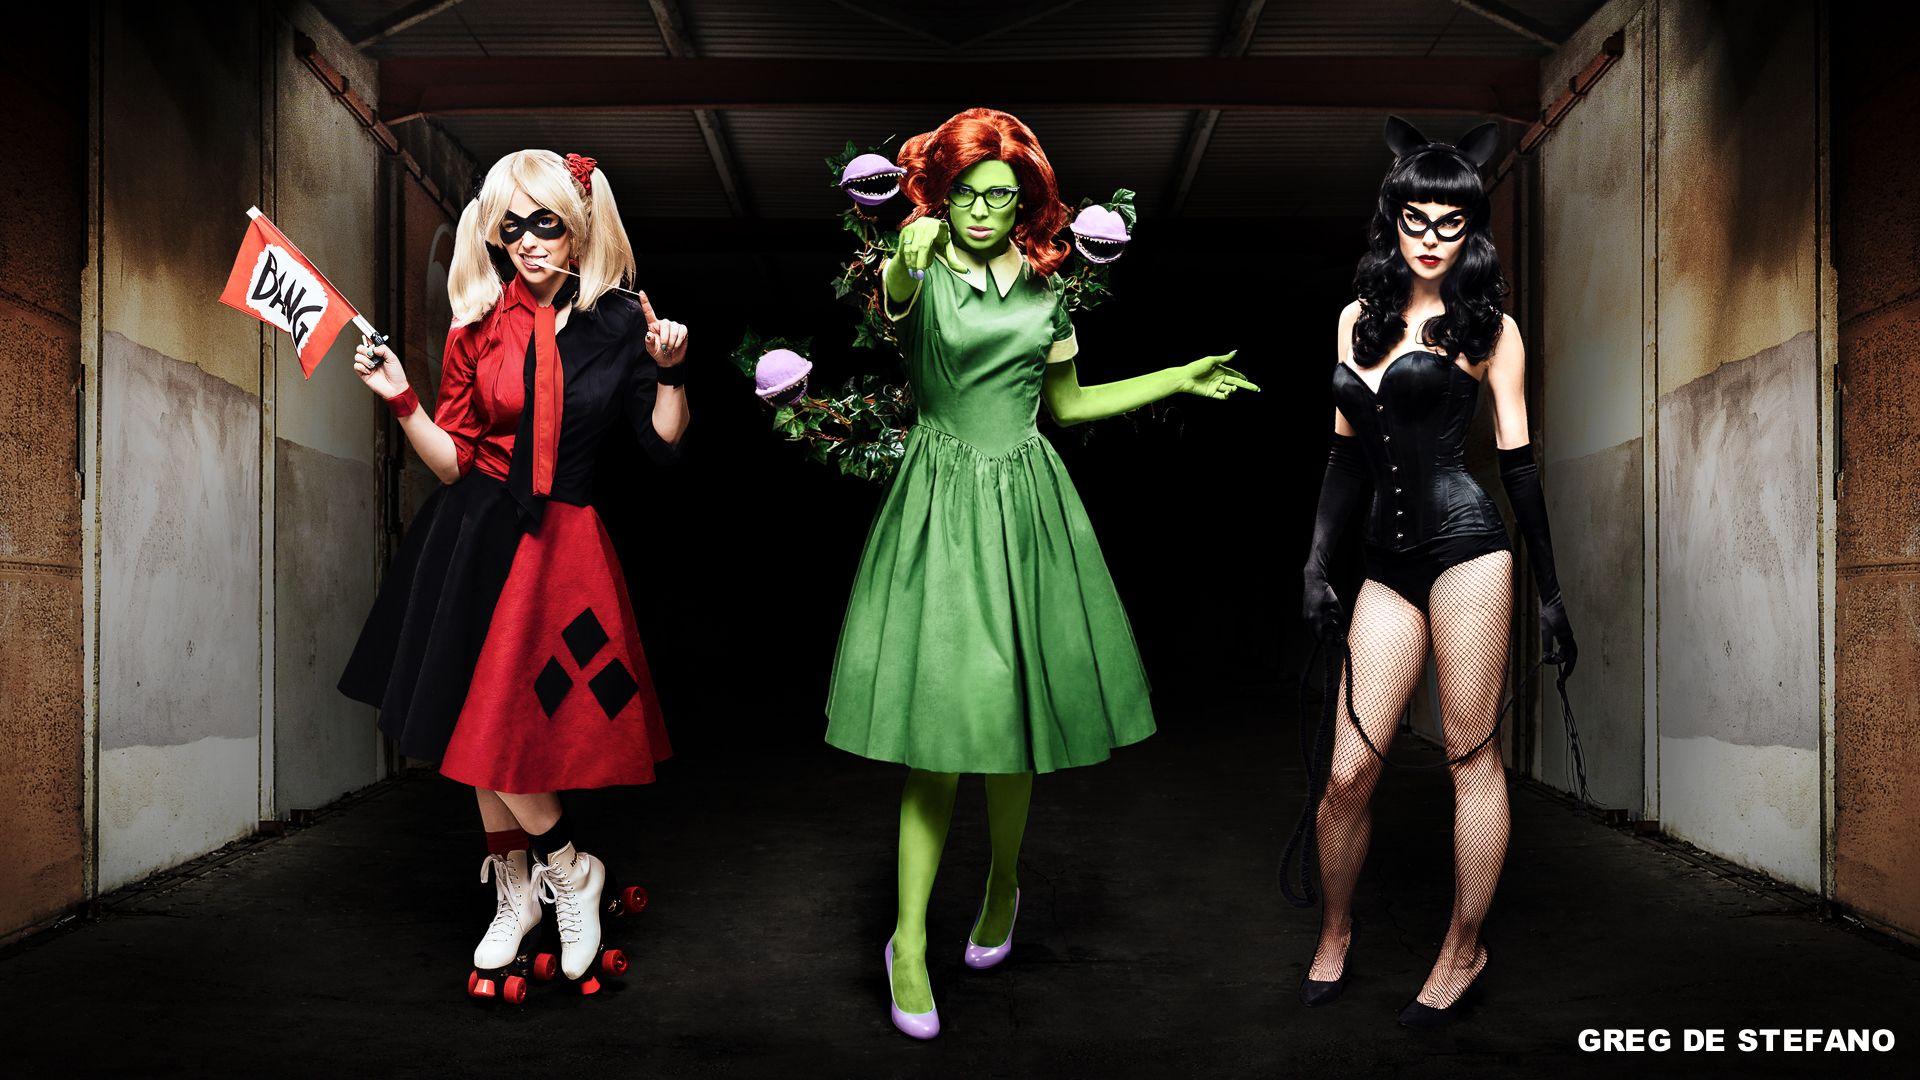 wildly fun rockabilly dc villainous cosplay for harley quinn, poison